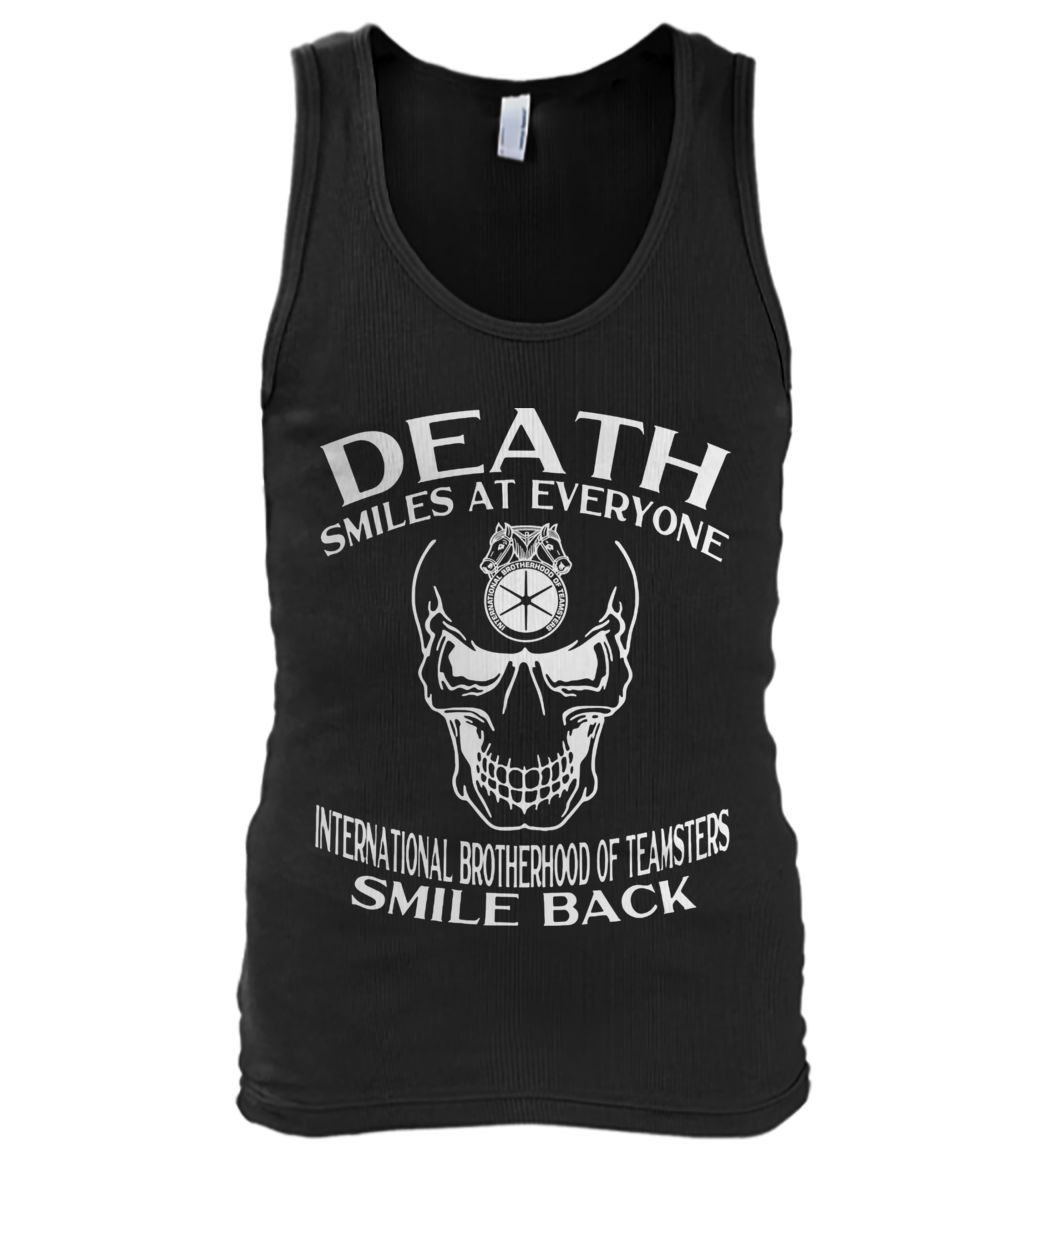 Skull death smiles at everyone international brotherhood of teamsters smile back tank top